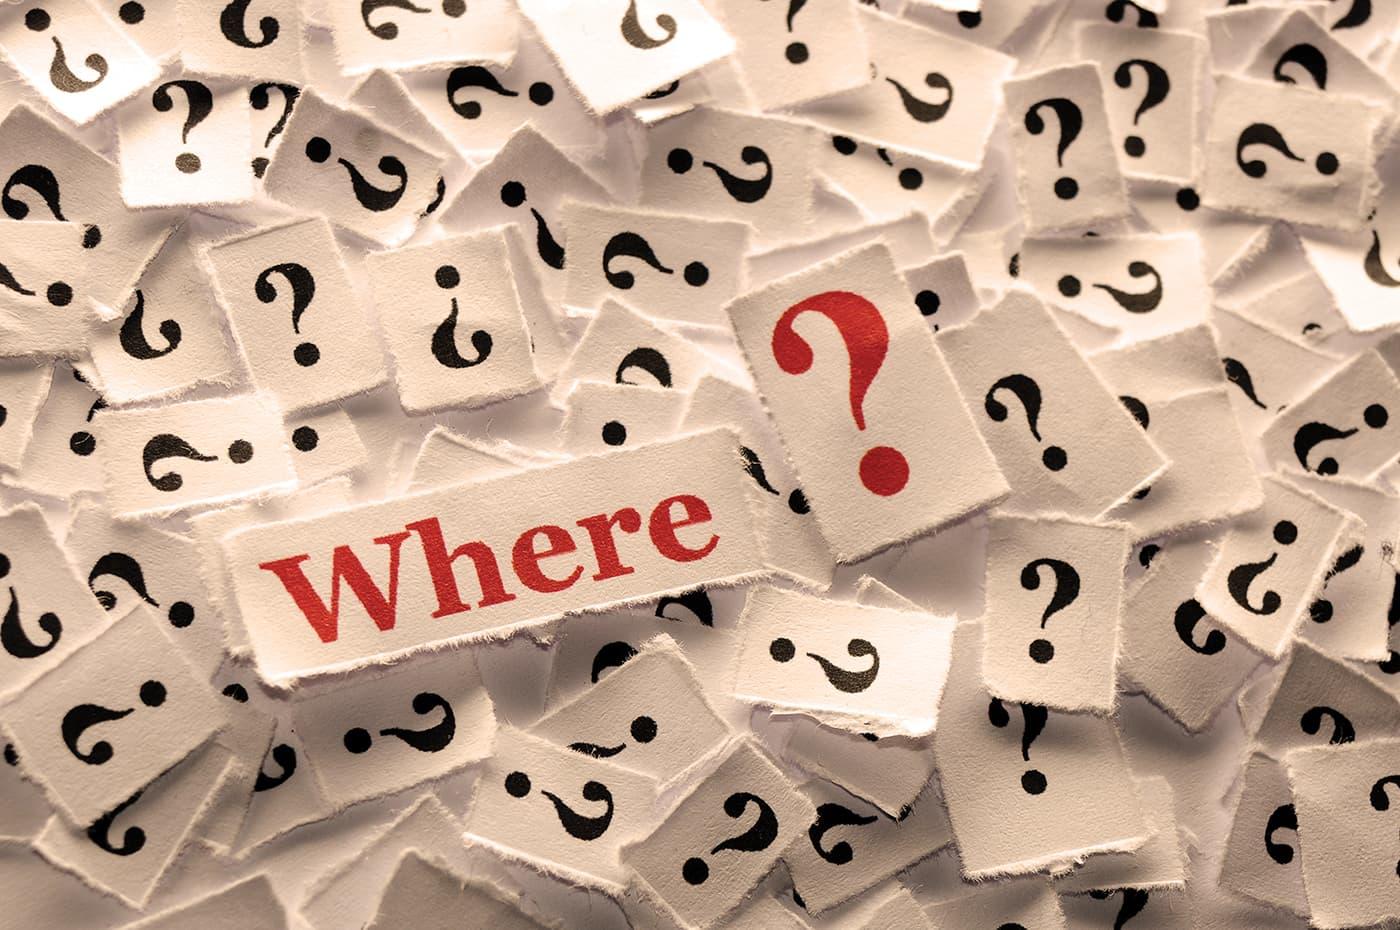 question where